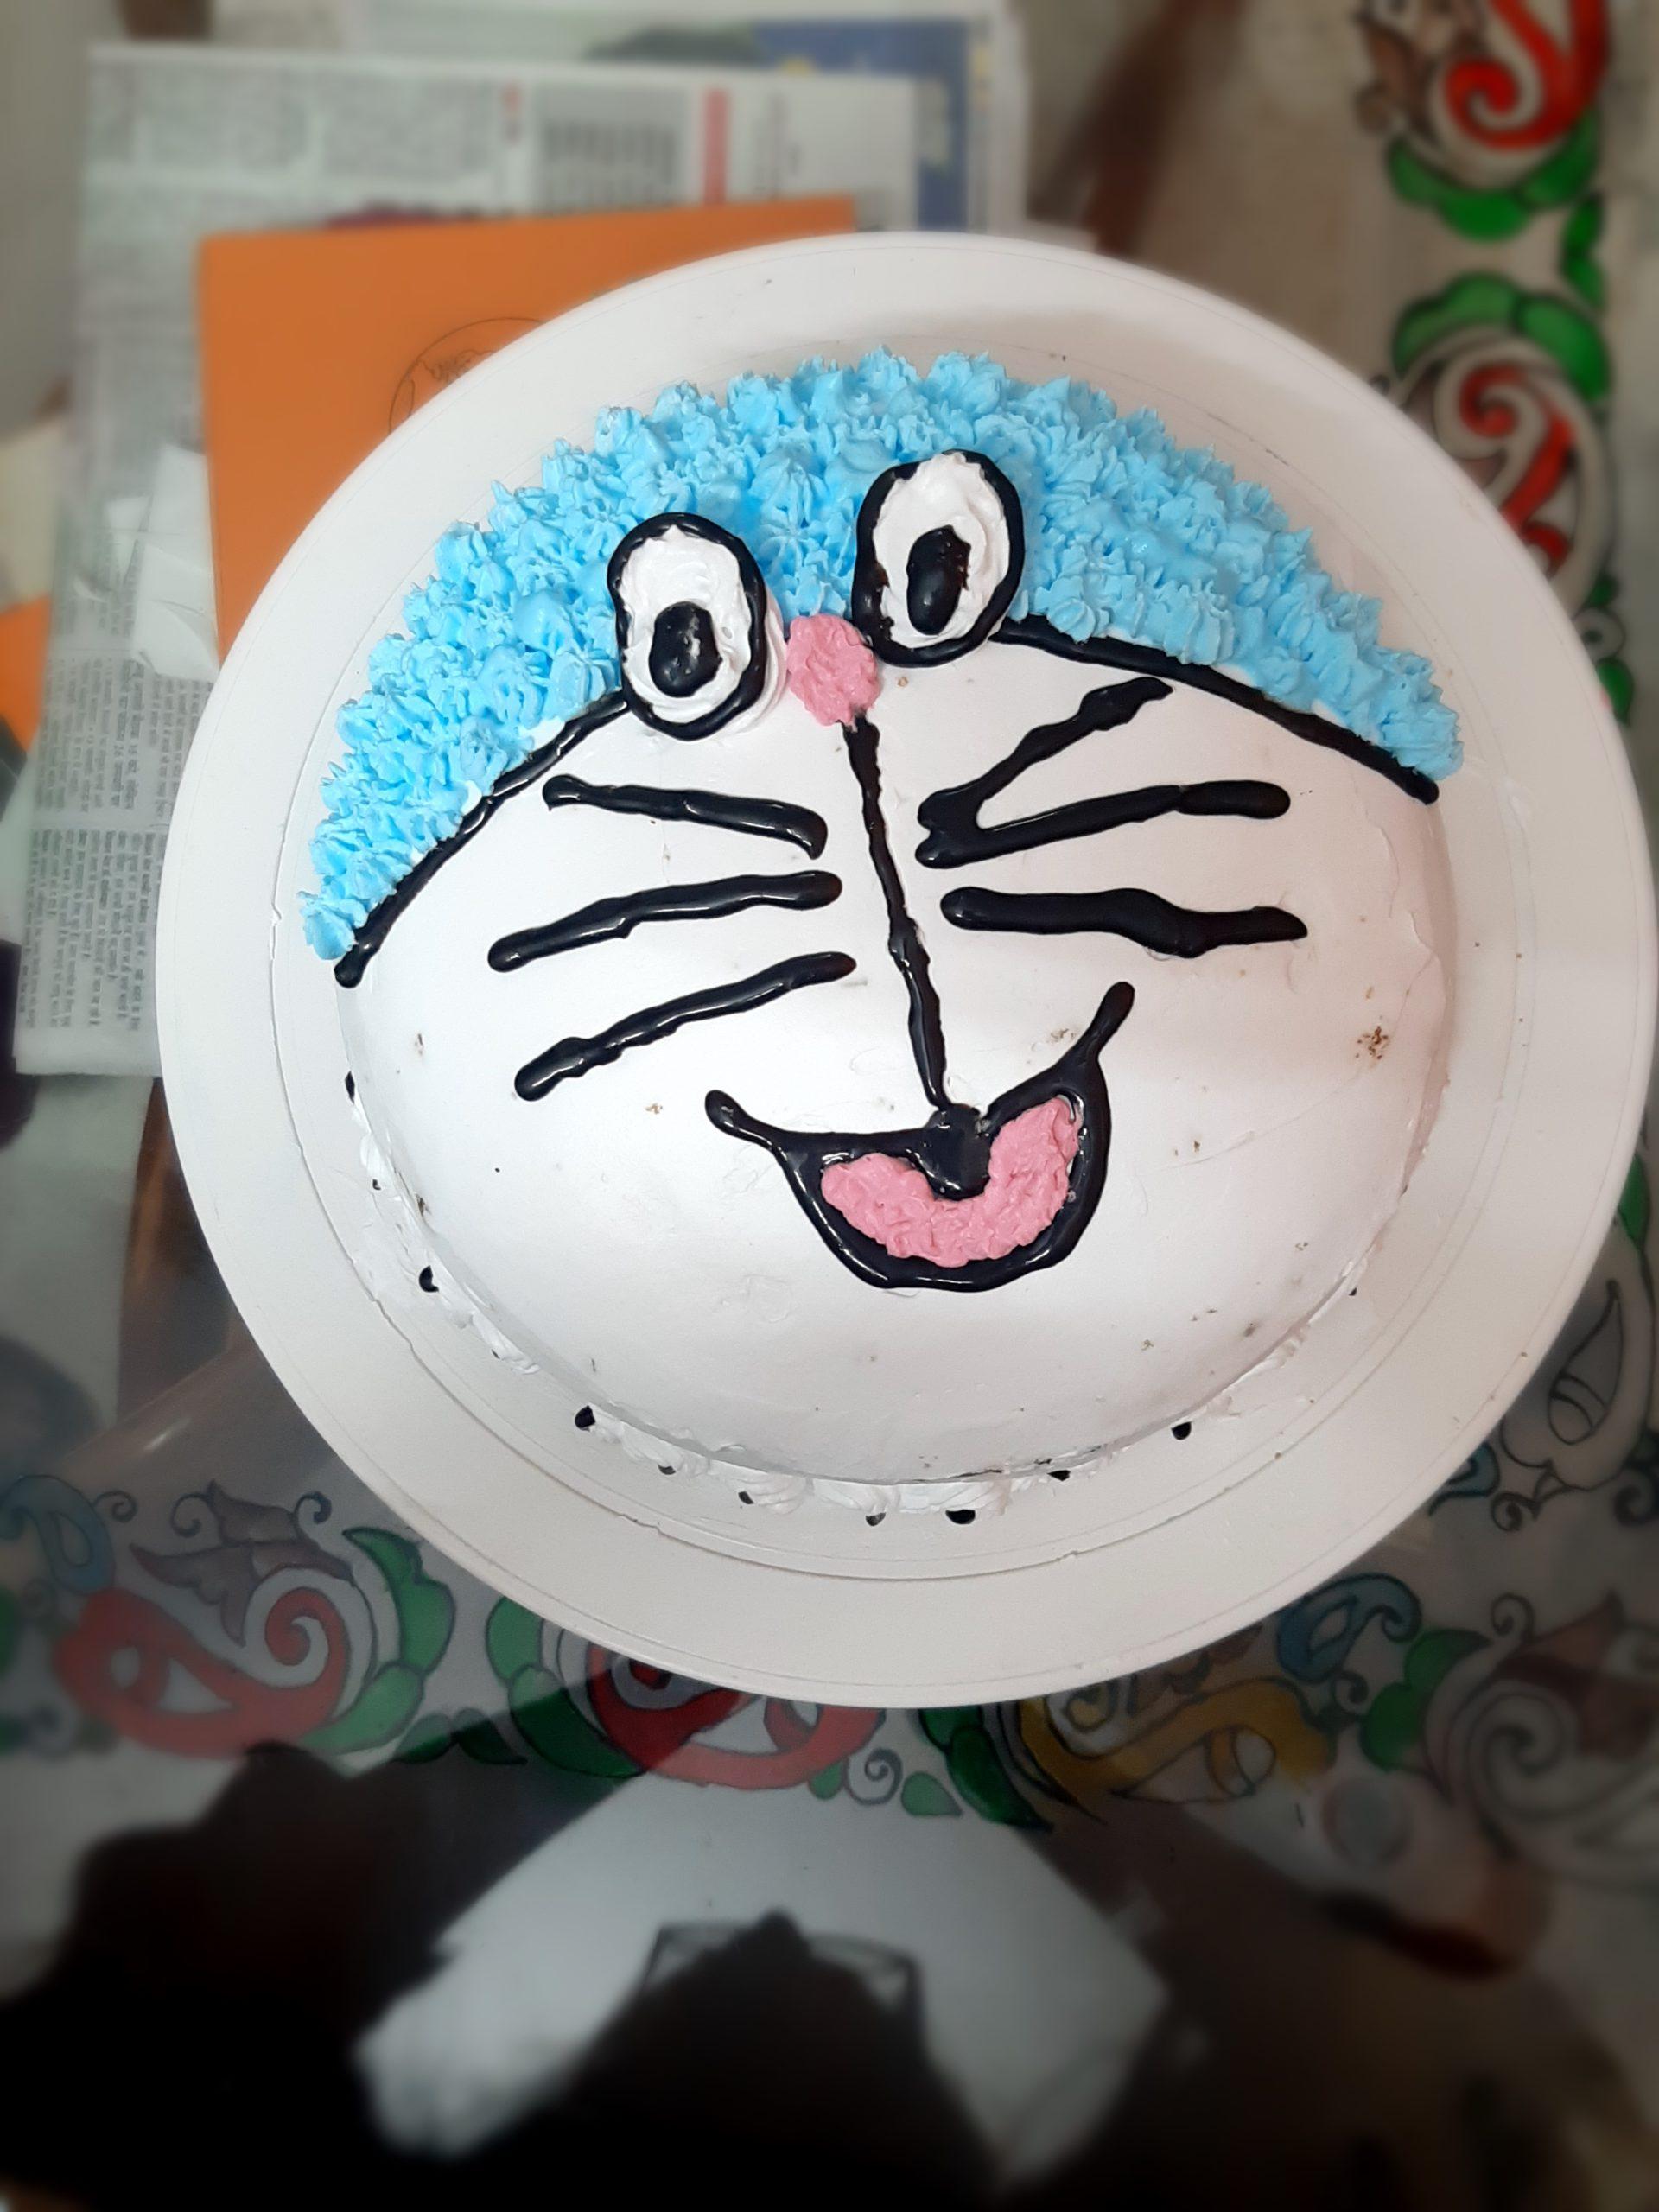 Doremon Theme Vanilla Cake Designs, Images, Price Near Me